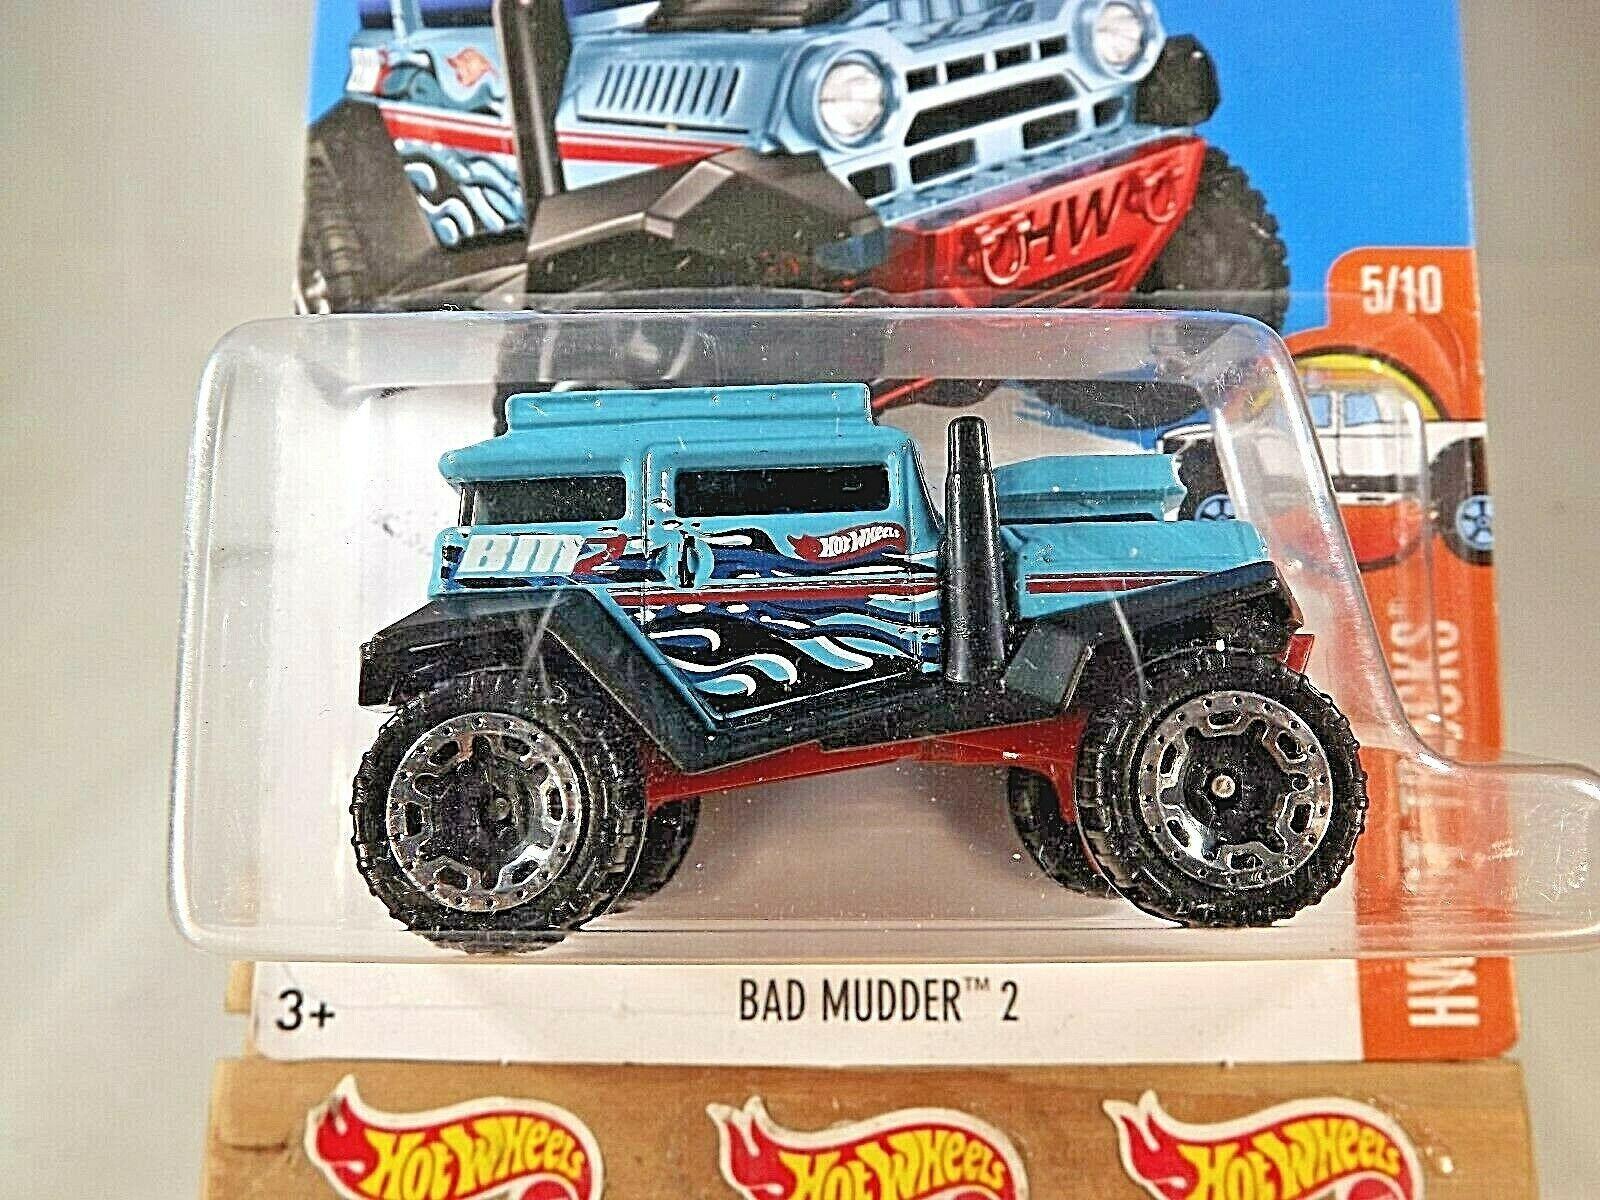 2016 Hot Wheels #145 HW Hot Trucks 5/10 BAD MUDDER 2 Aqua